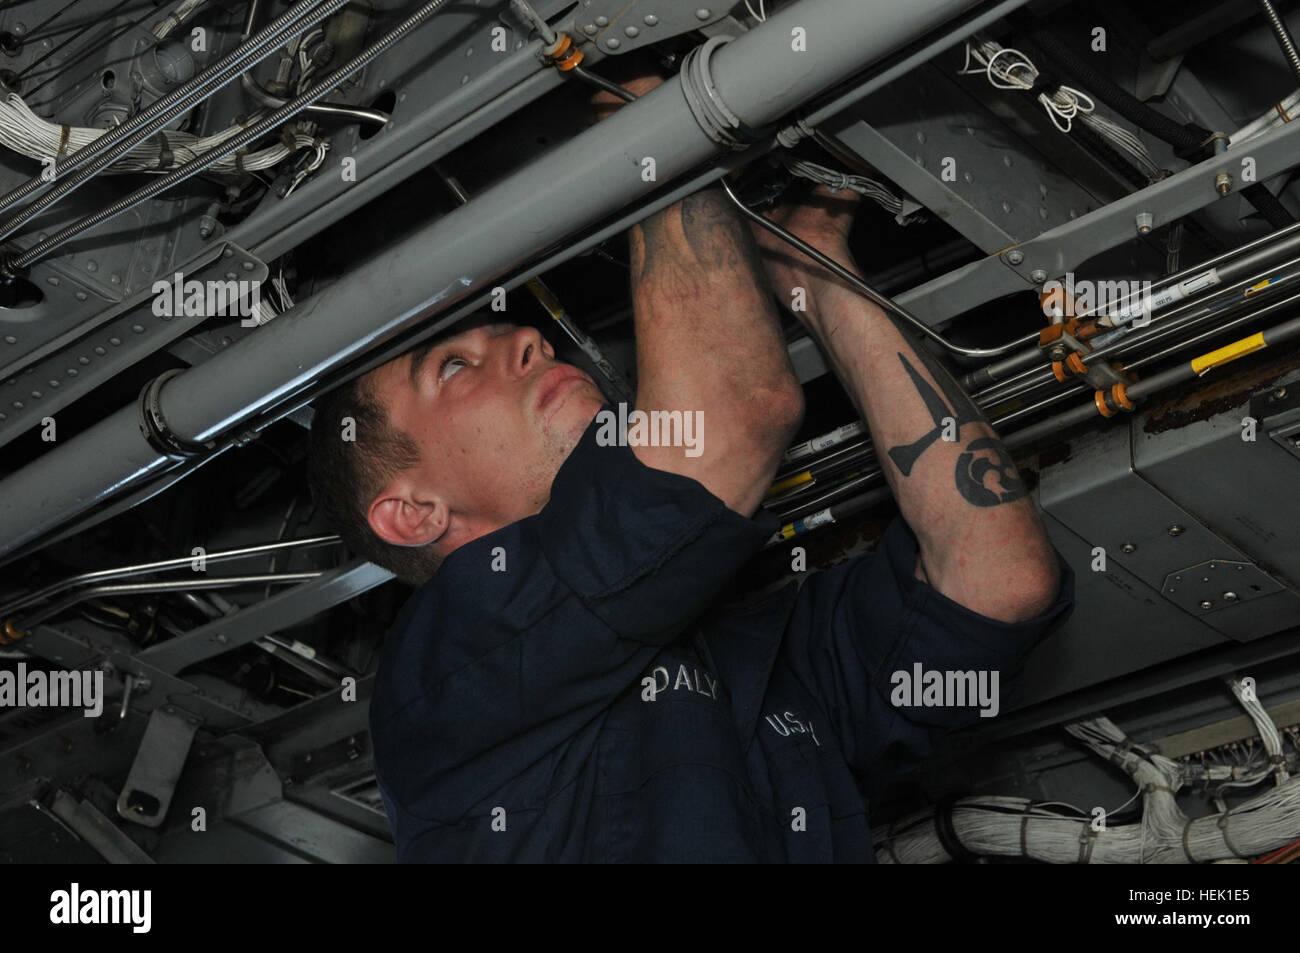 GUANTANAMO BAY, Cuba – Aviation Structural Mechanic Airman Antonio J. Daly of Helicopter Mine Countermeasures Squadron Stock Photo